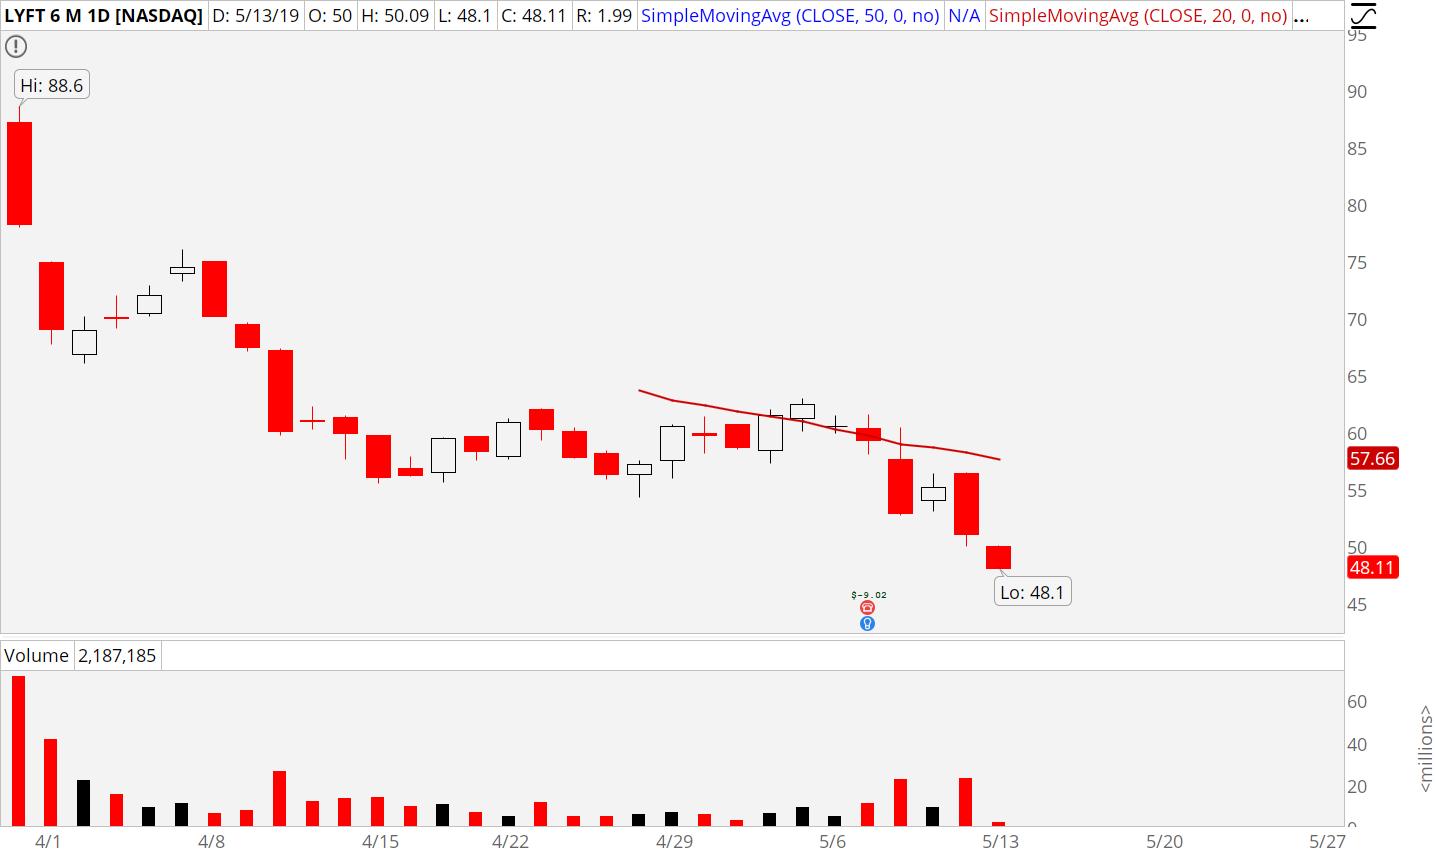 3 Stocks to Sell: Lyft (LYFT)